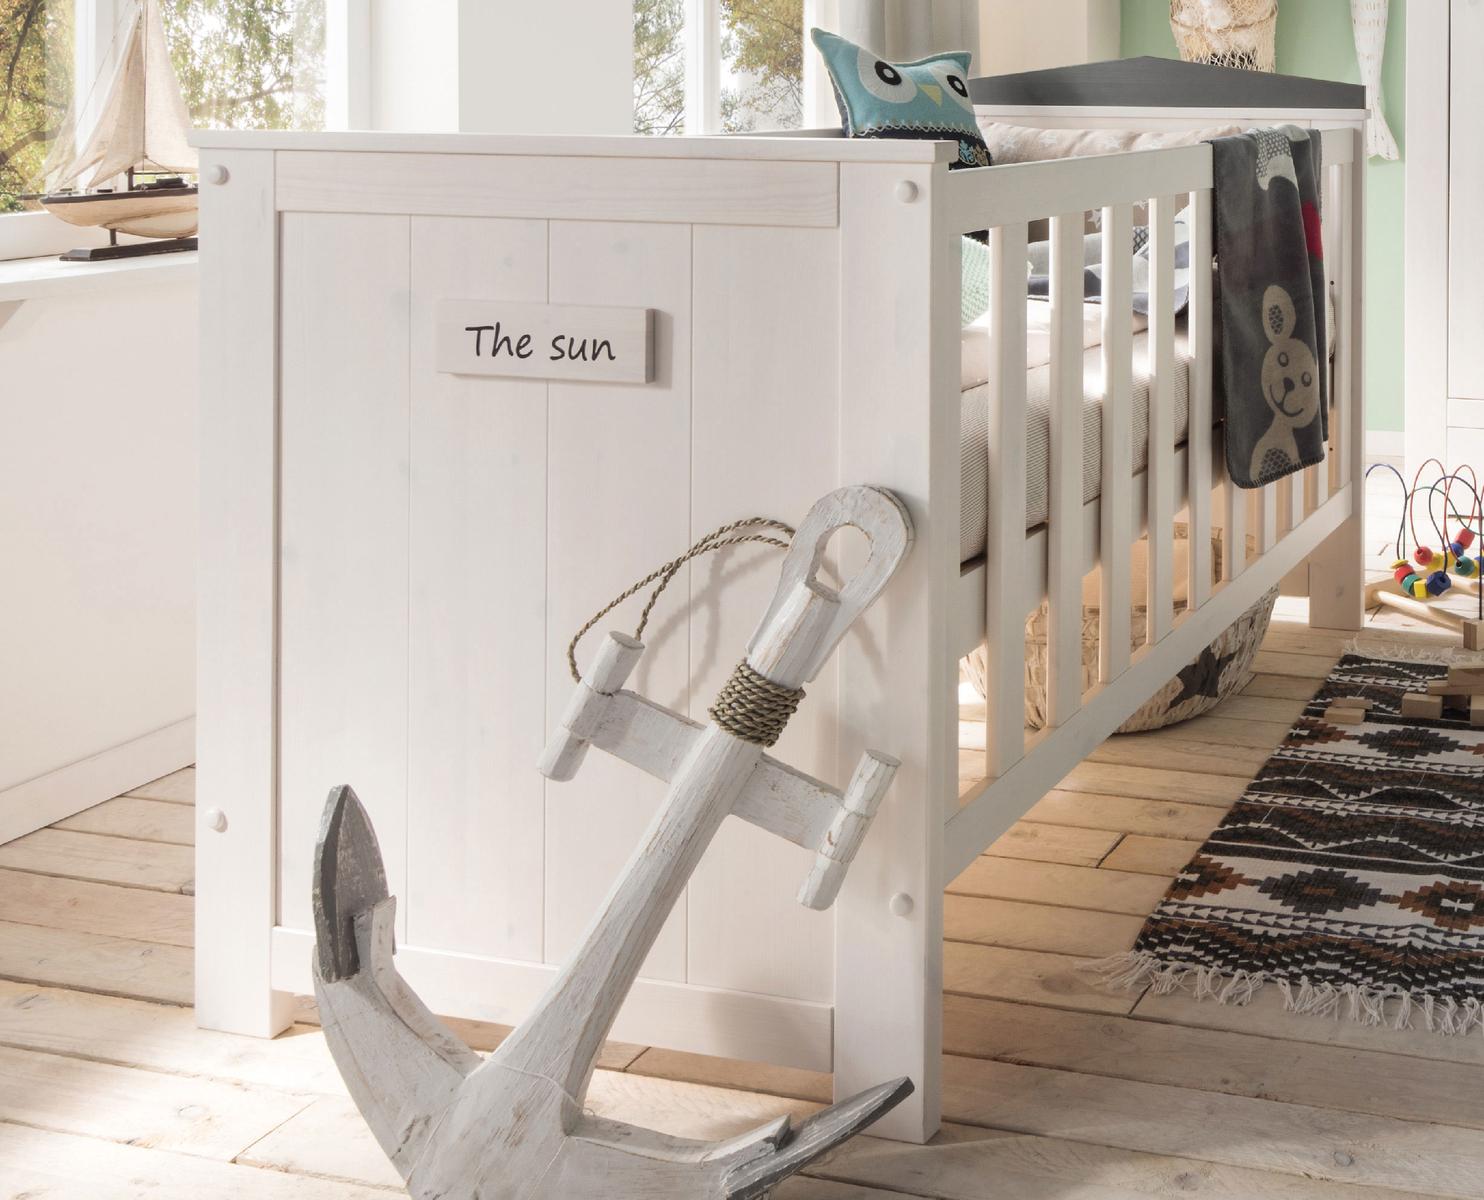 INFANSKIDS Babyzimmer Kinderzimmer Lucky Massivholz, Bild 2